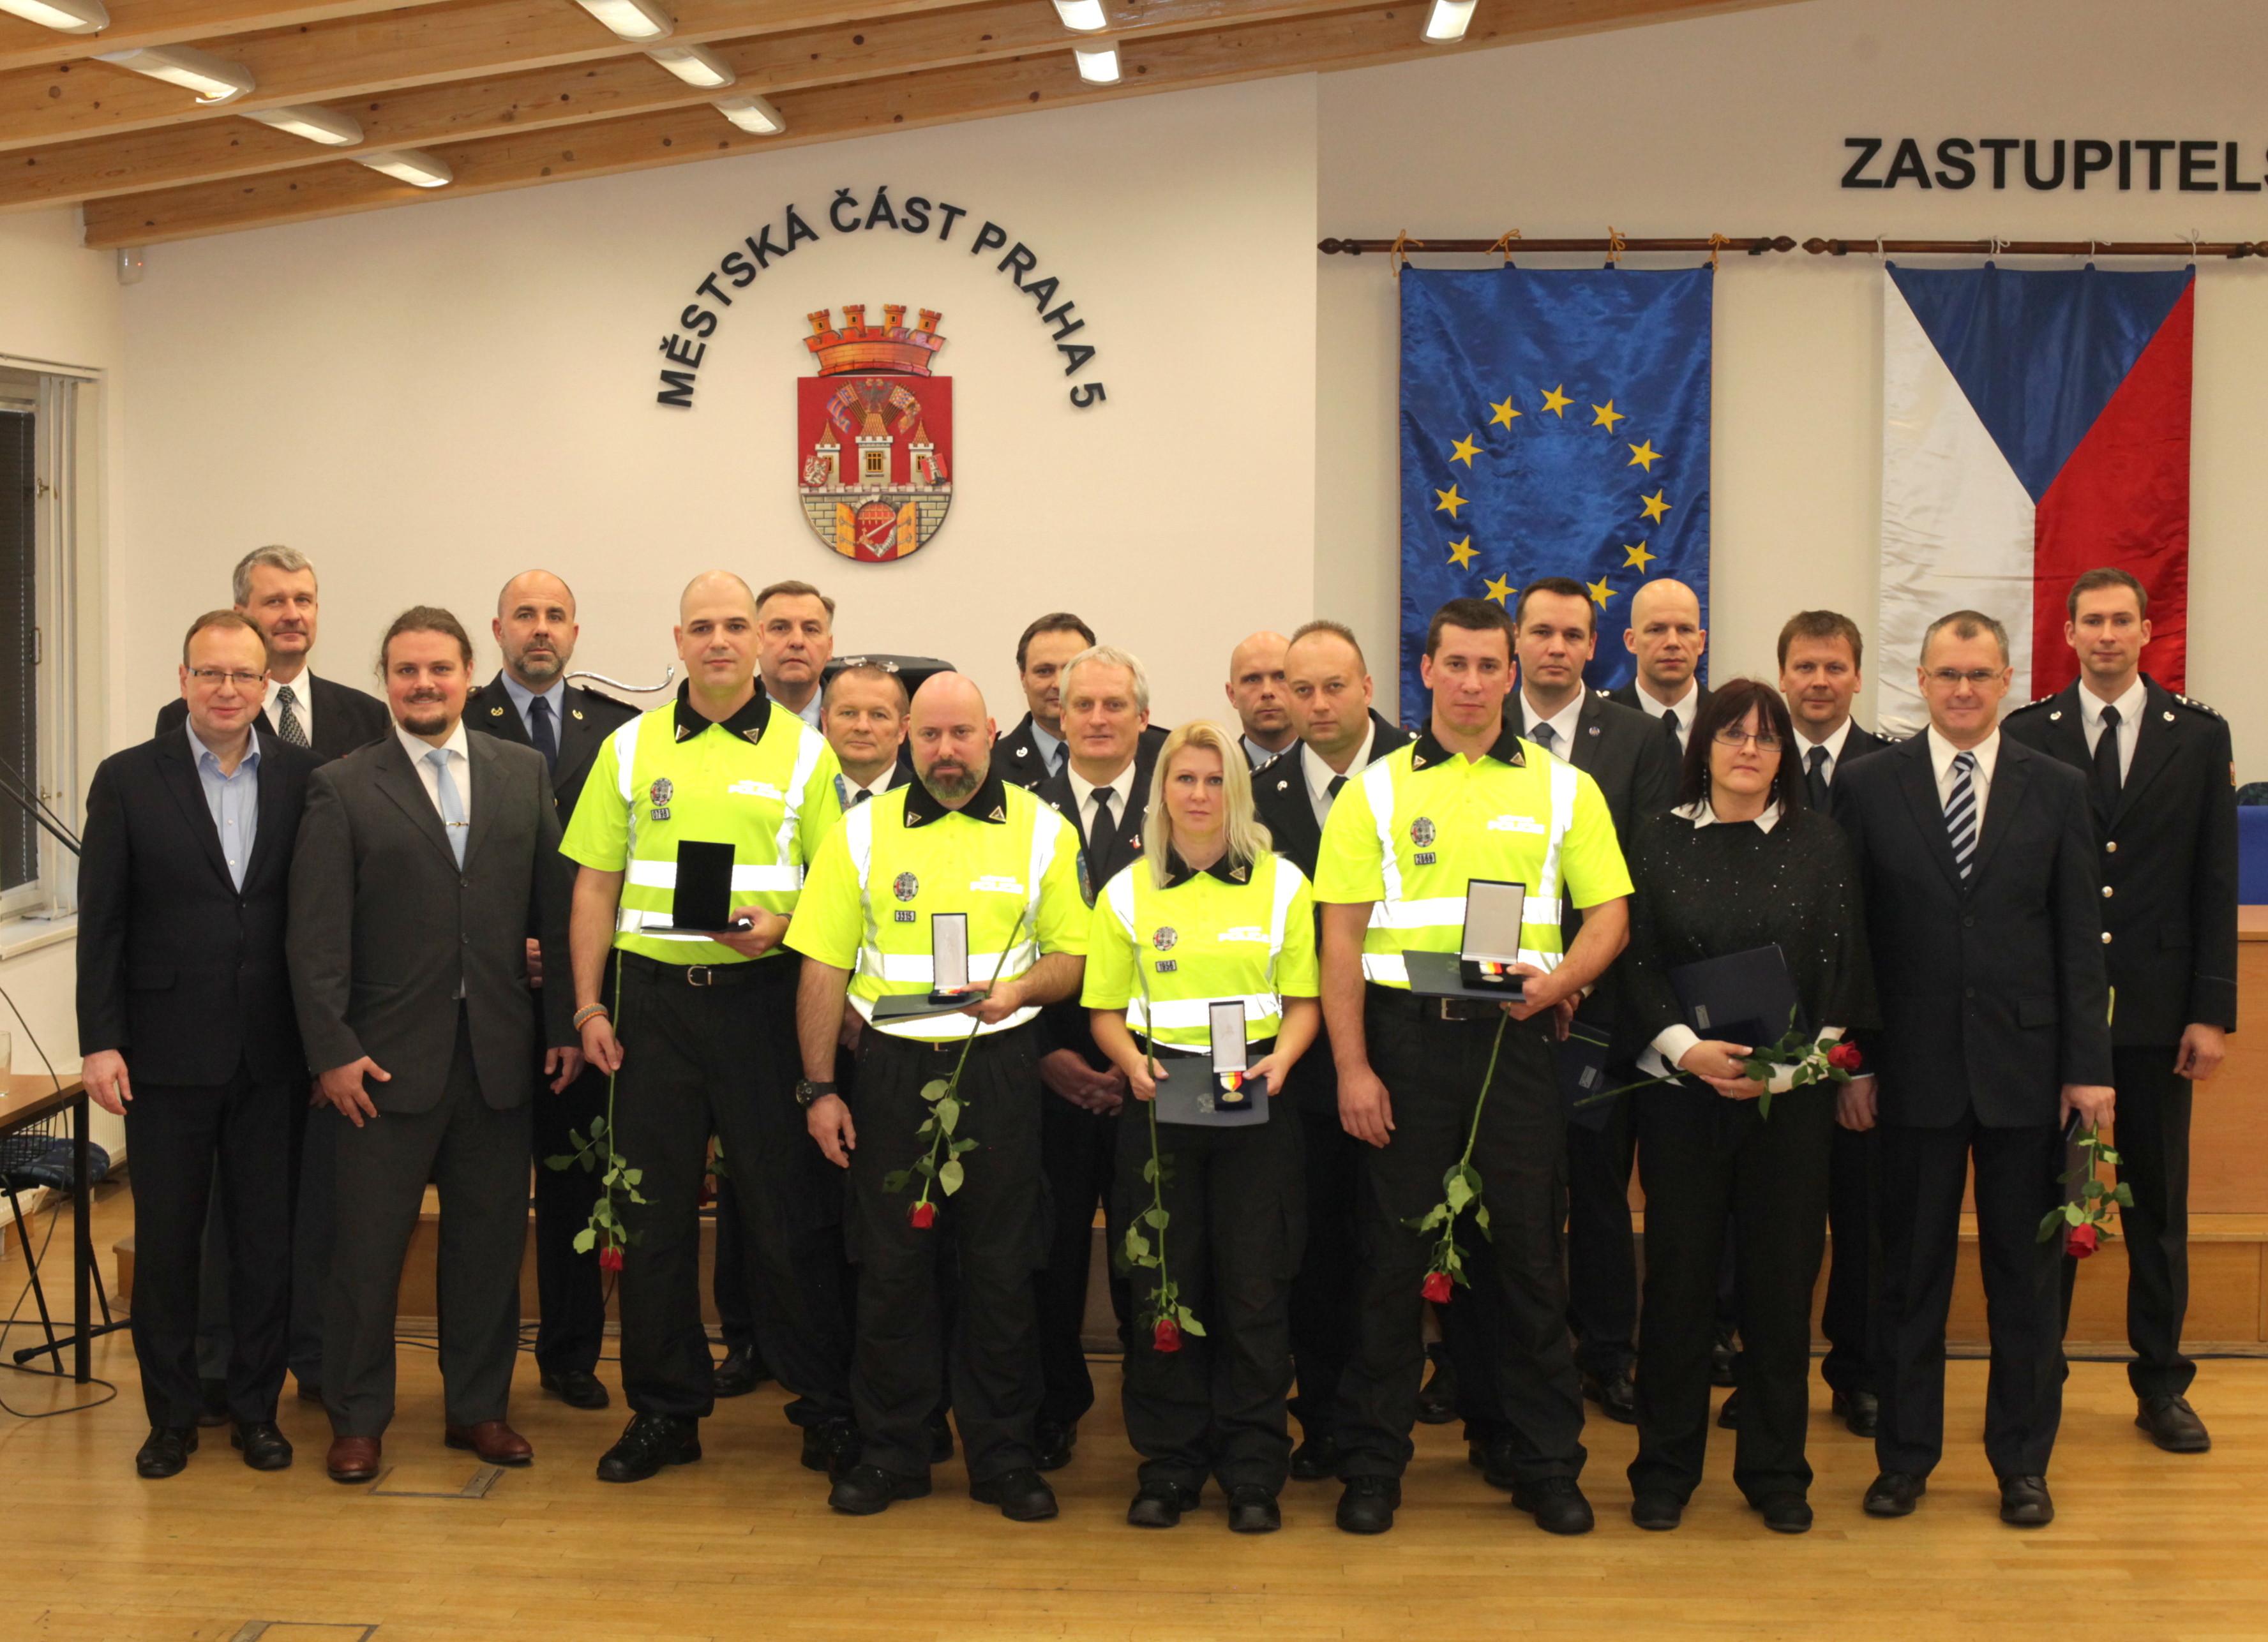 policistky-policiste-a-hasici-prevzali-zasluzne-medaile